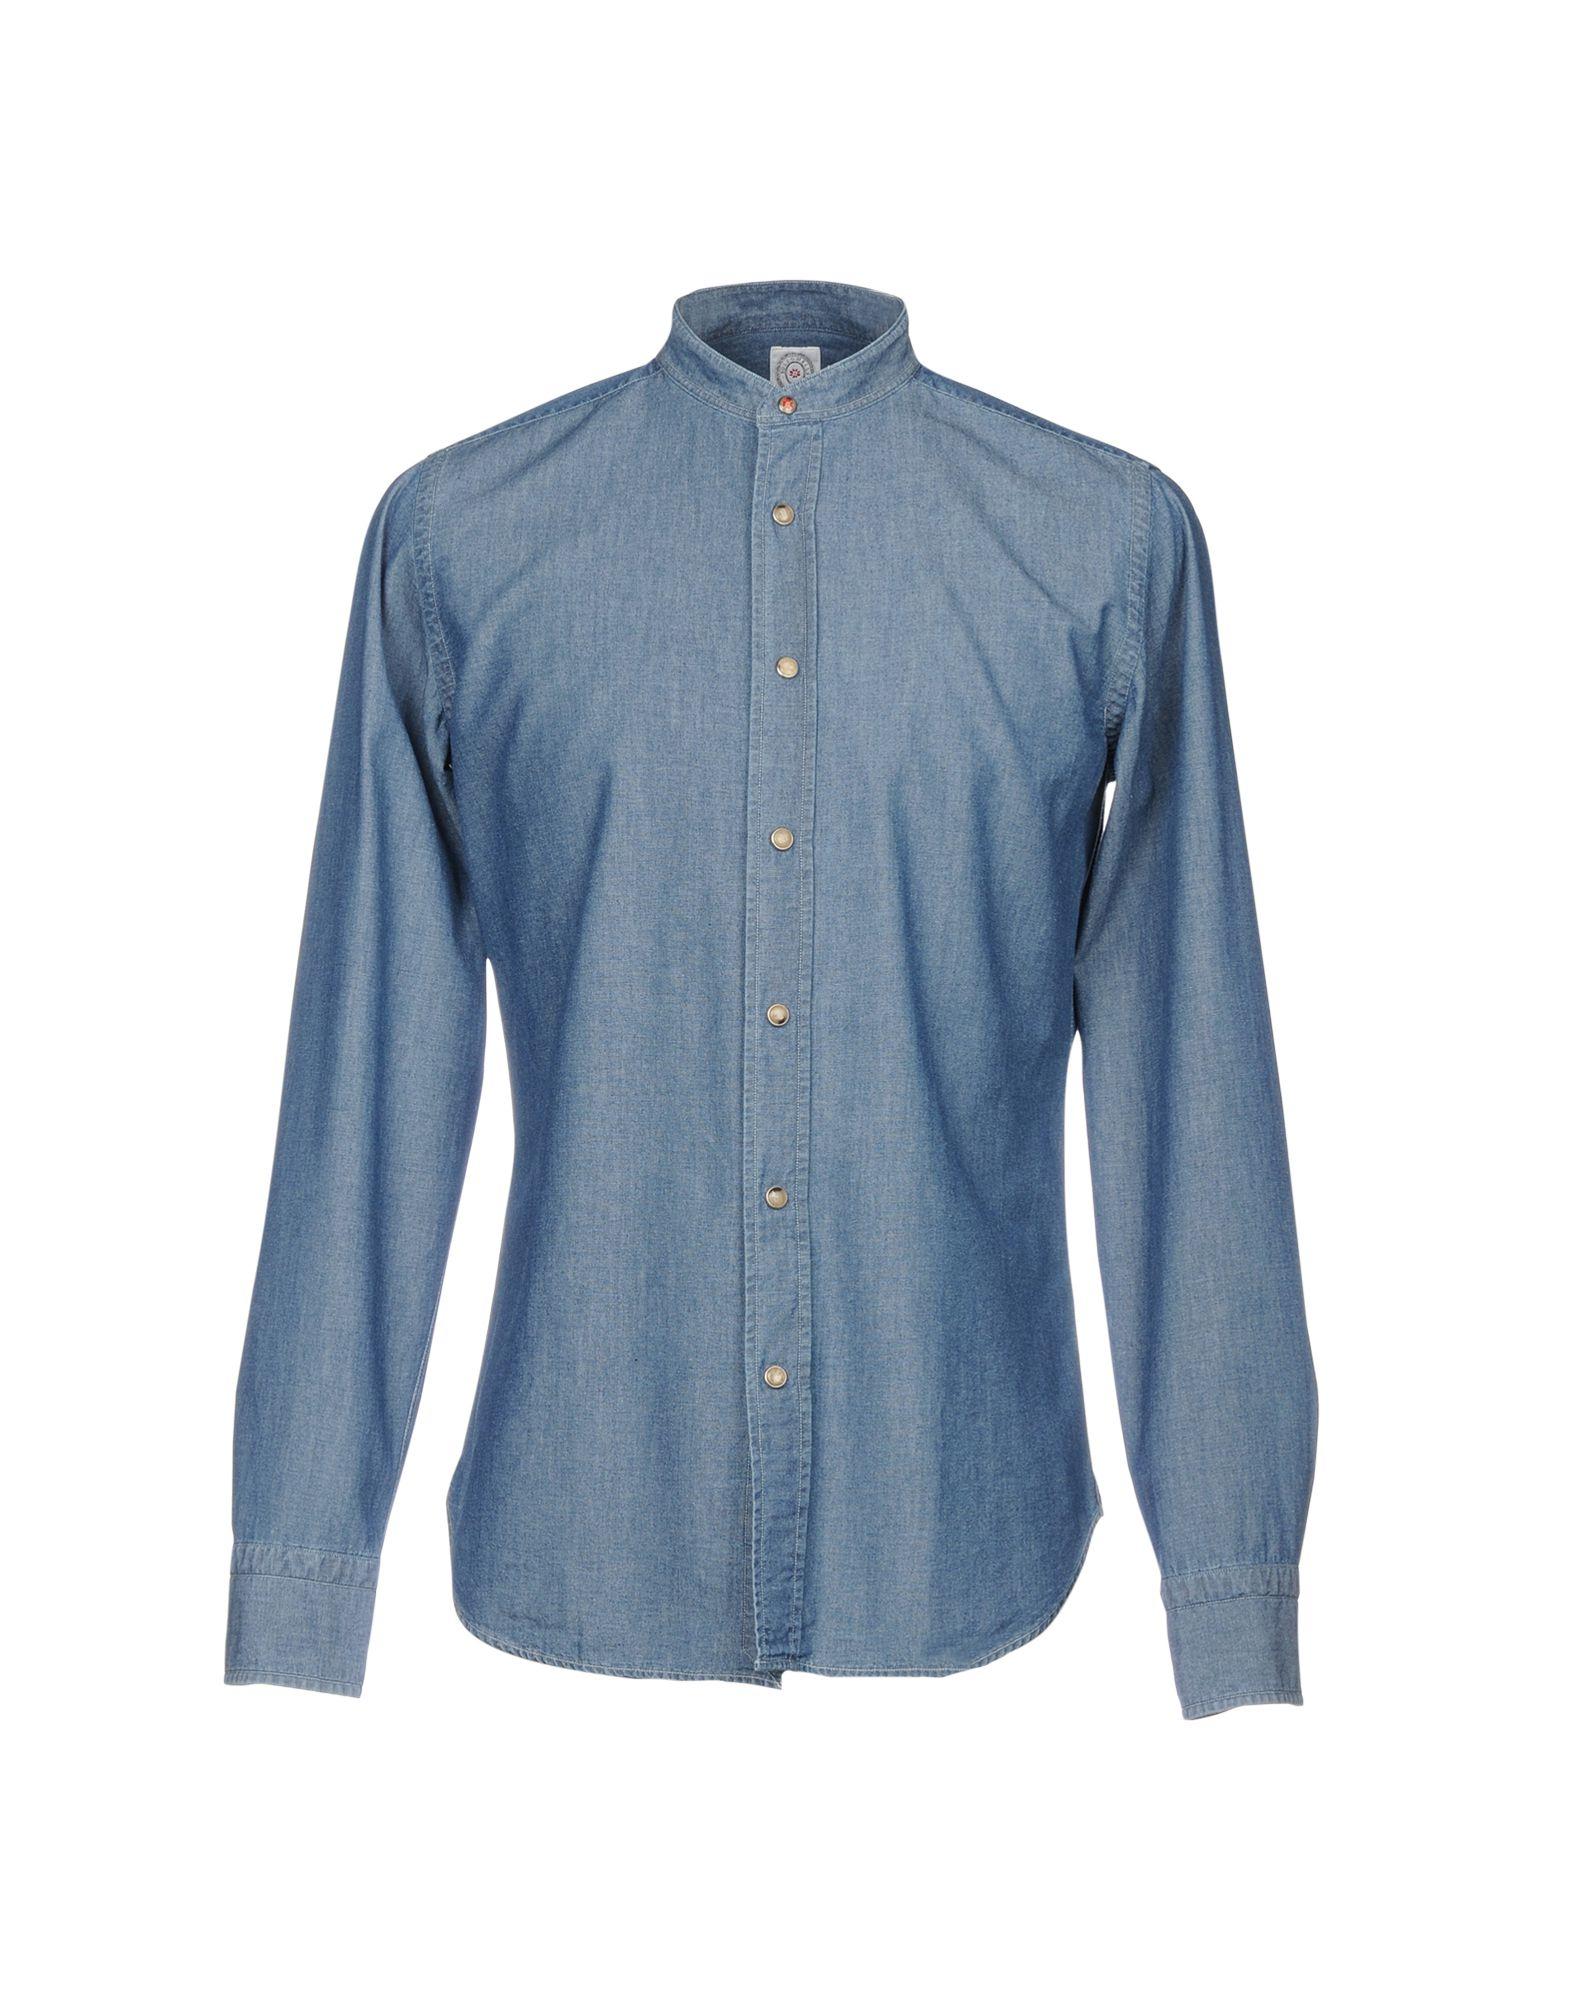 BOLZONELLA 1934 Denim Shirts in Blue